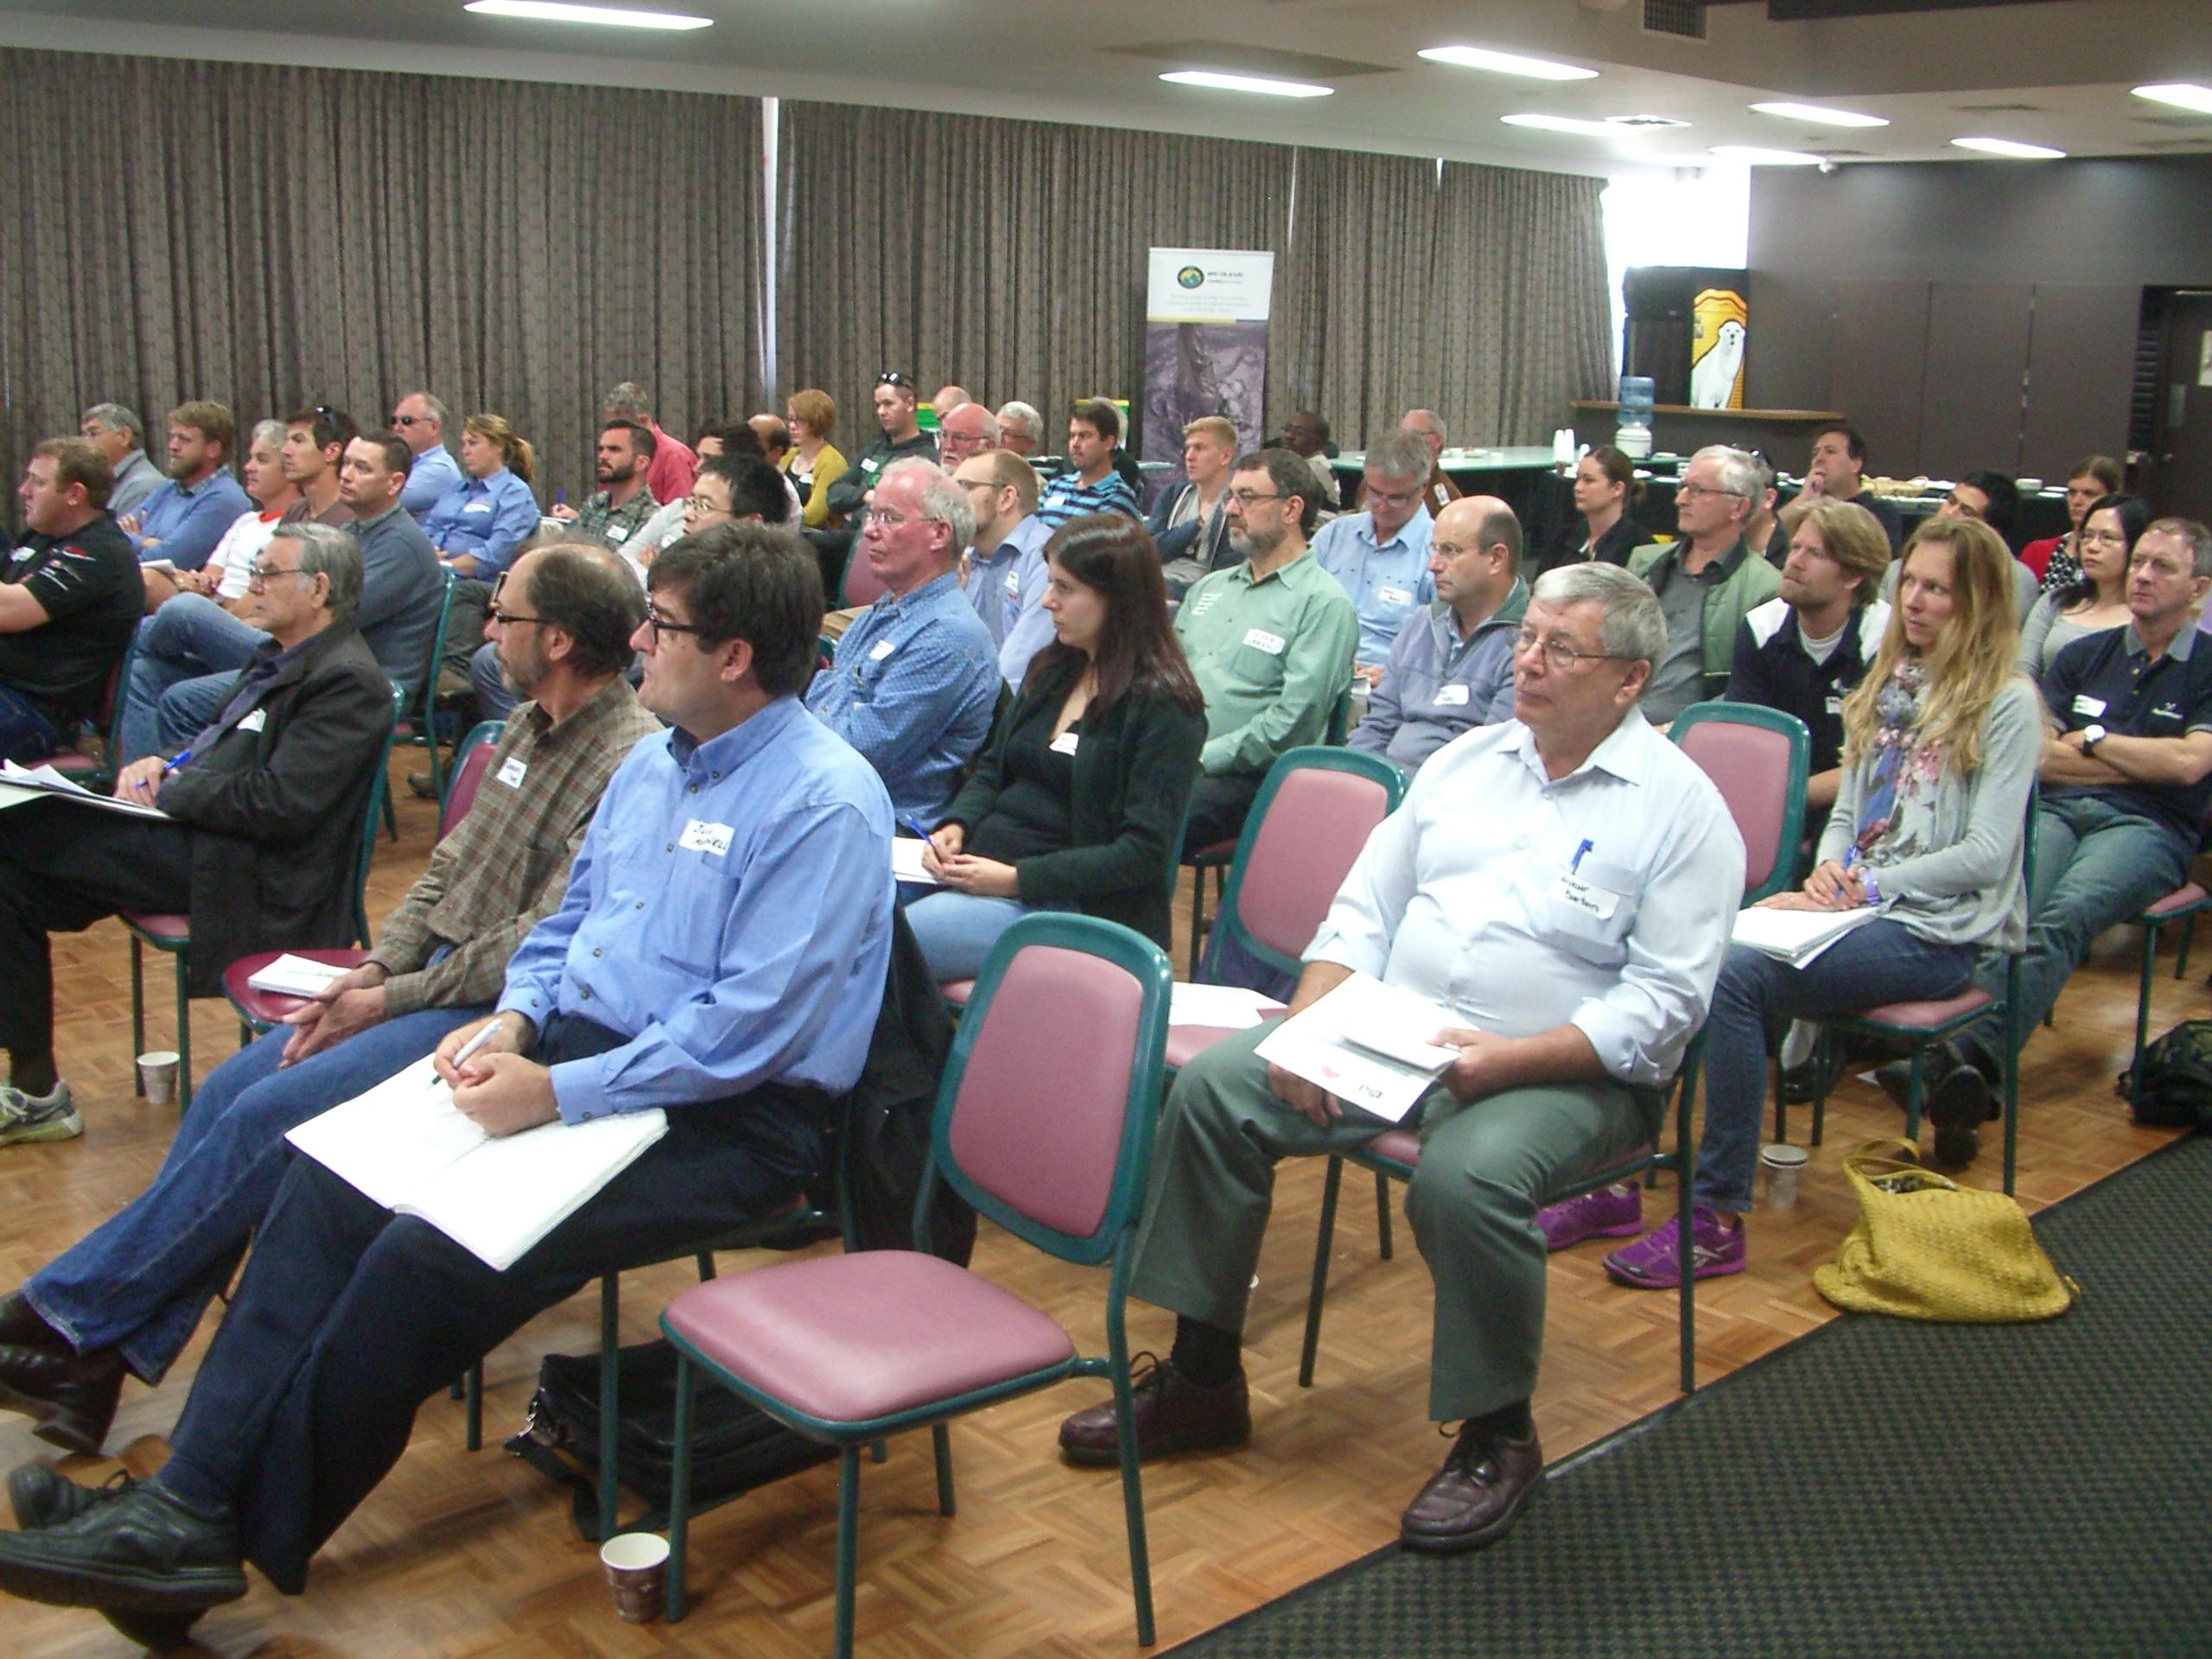 55 participants enjoyed an informative seminar